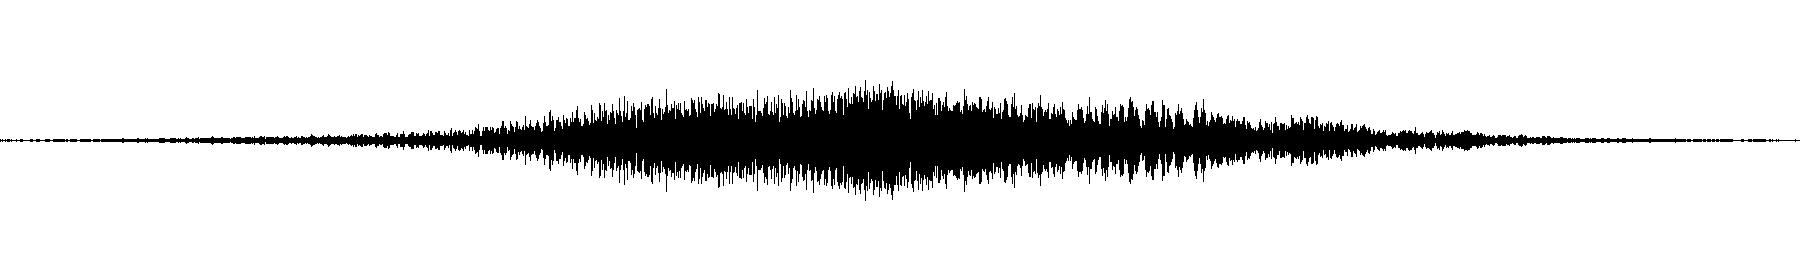 fx 09